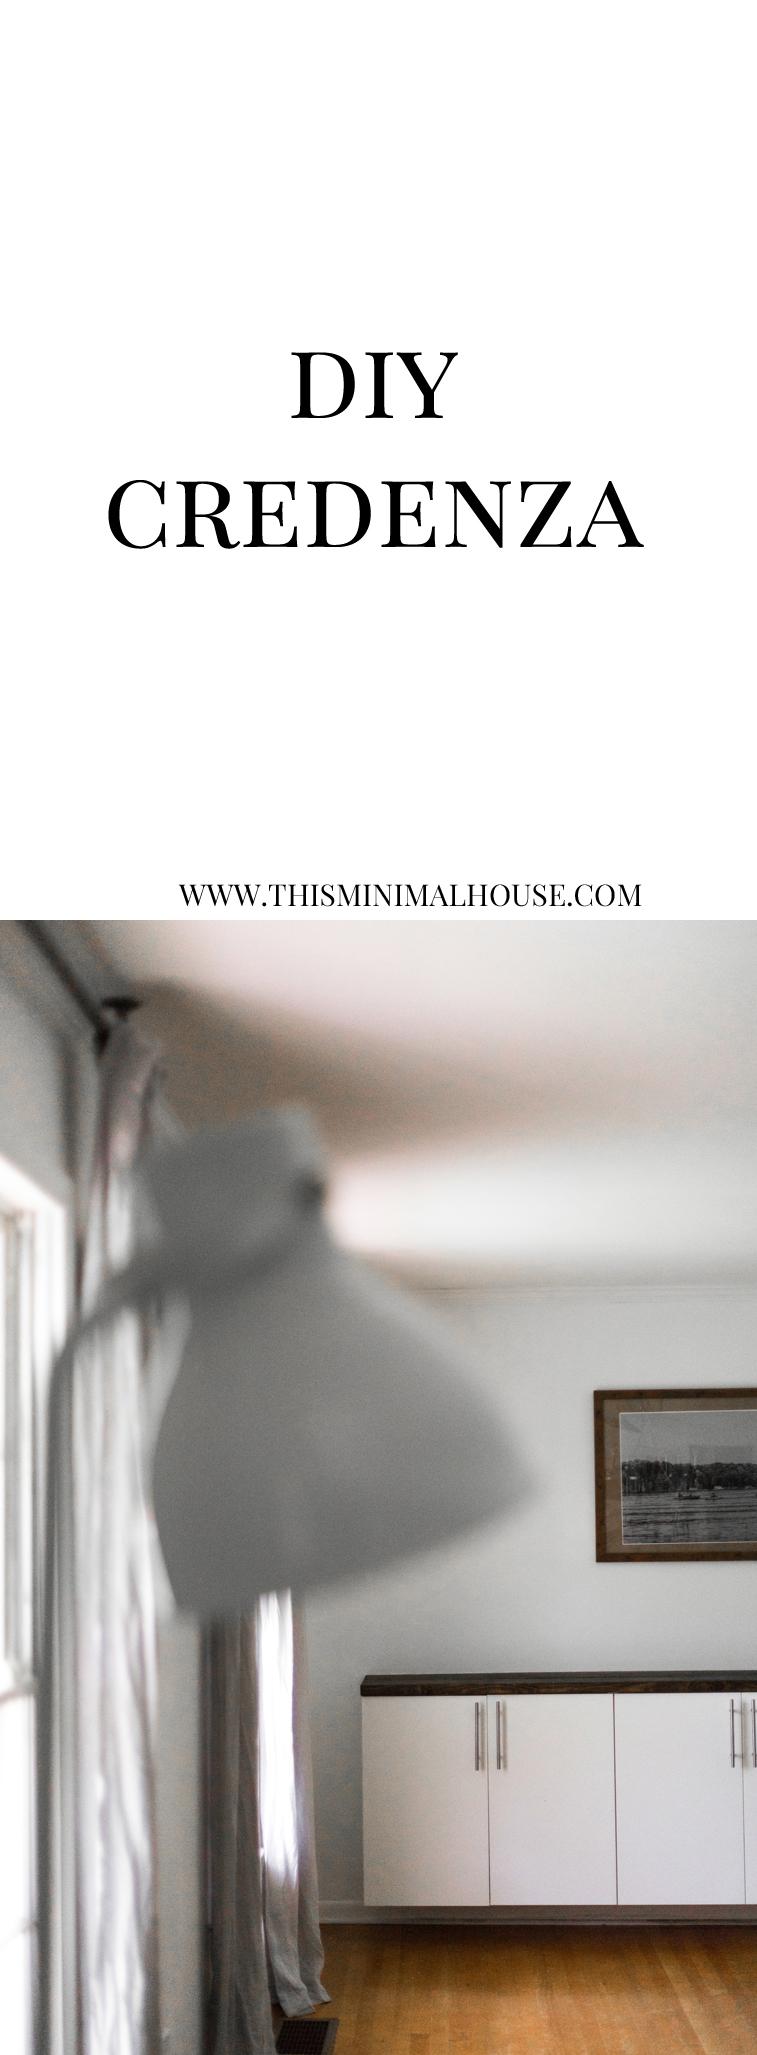 BUILD A CREDENZA www.thisminimalhouse.com